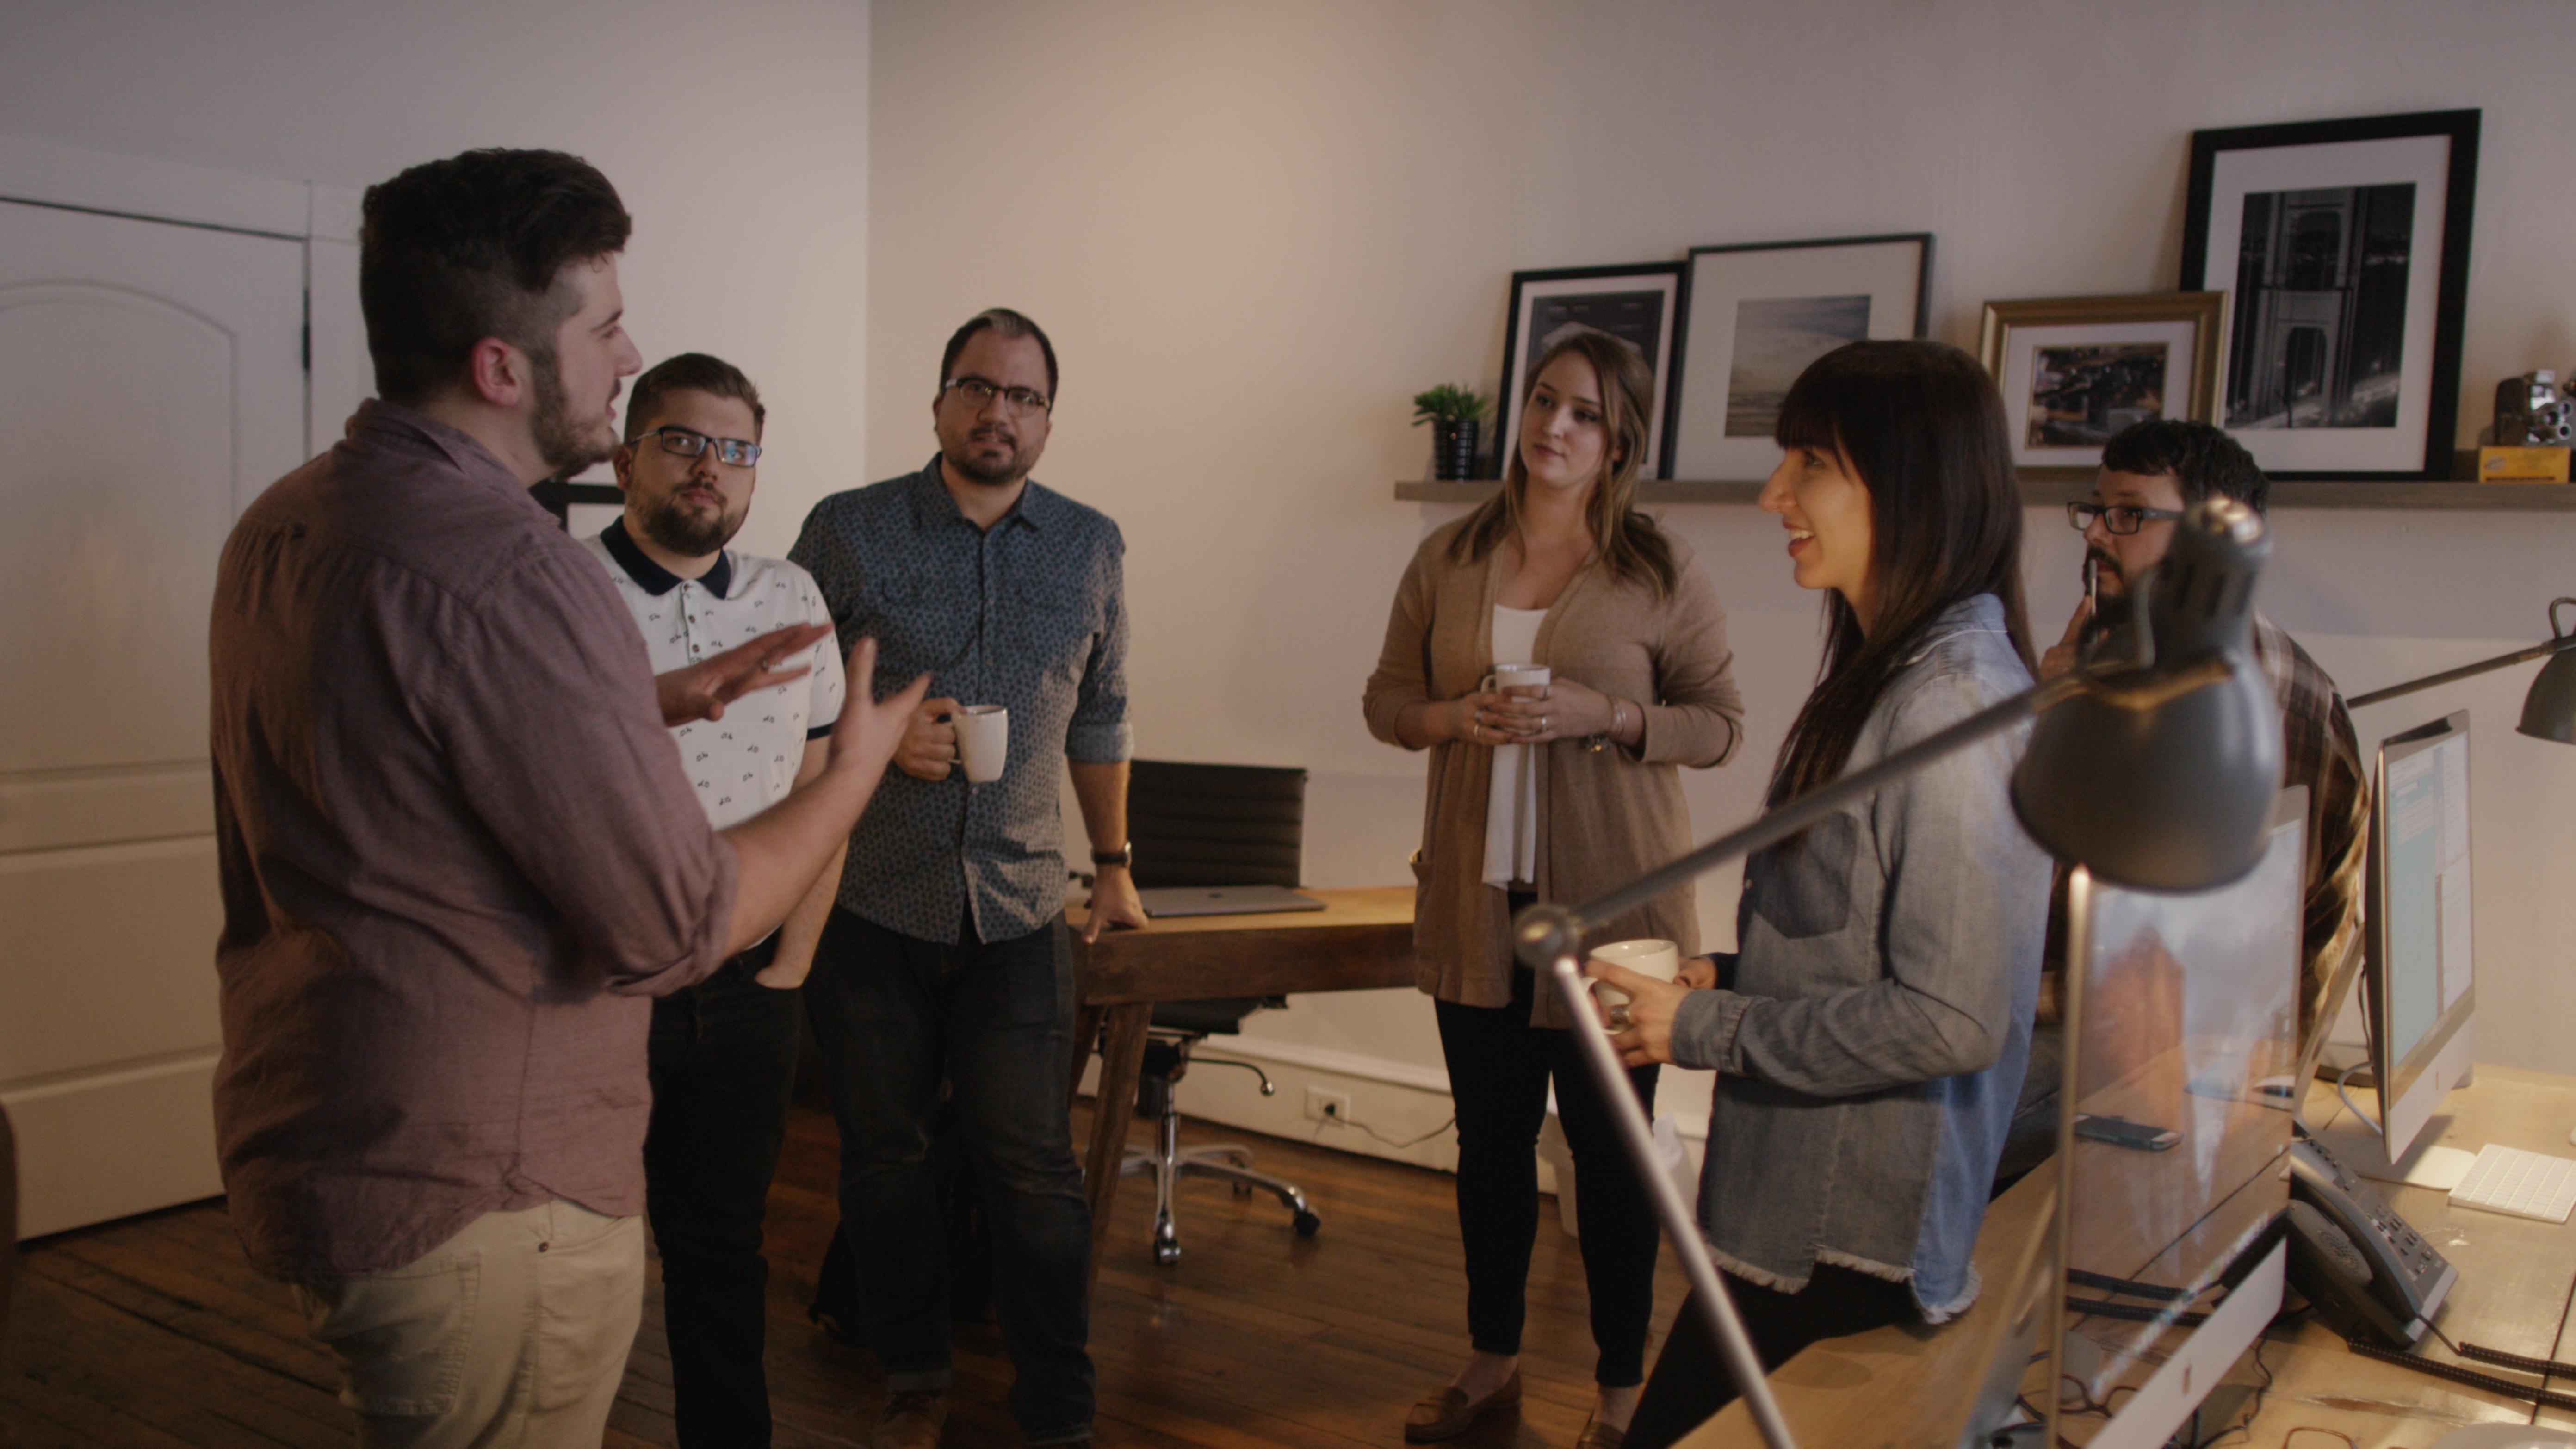 MAKE films team in a meeting